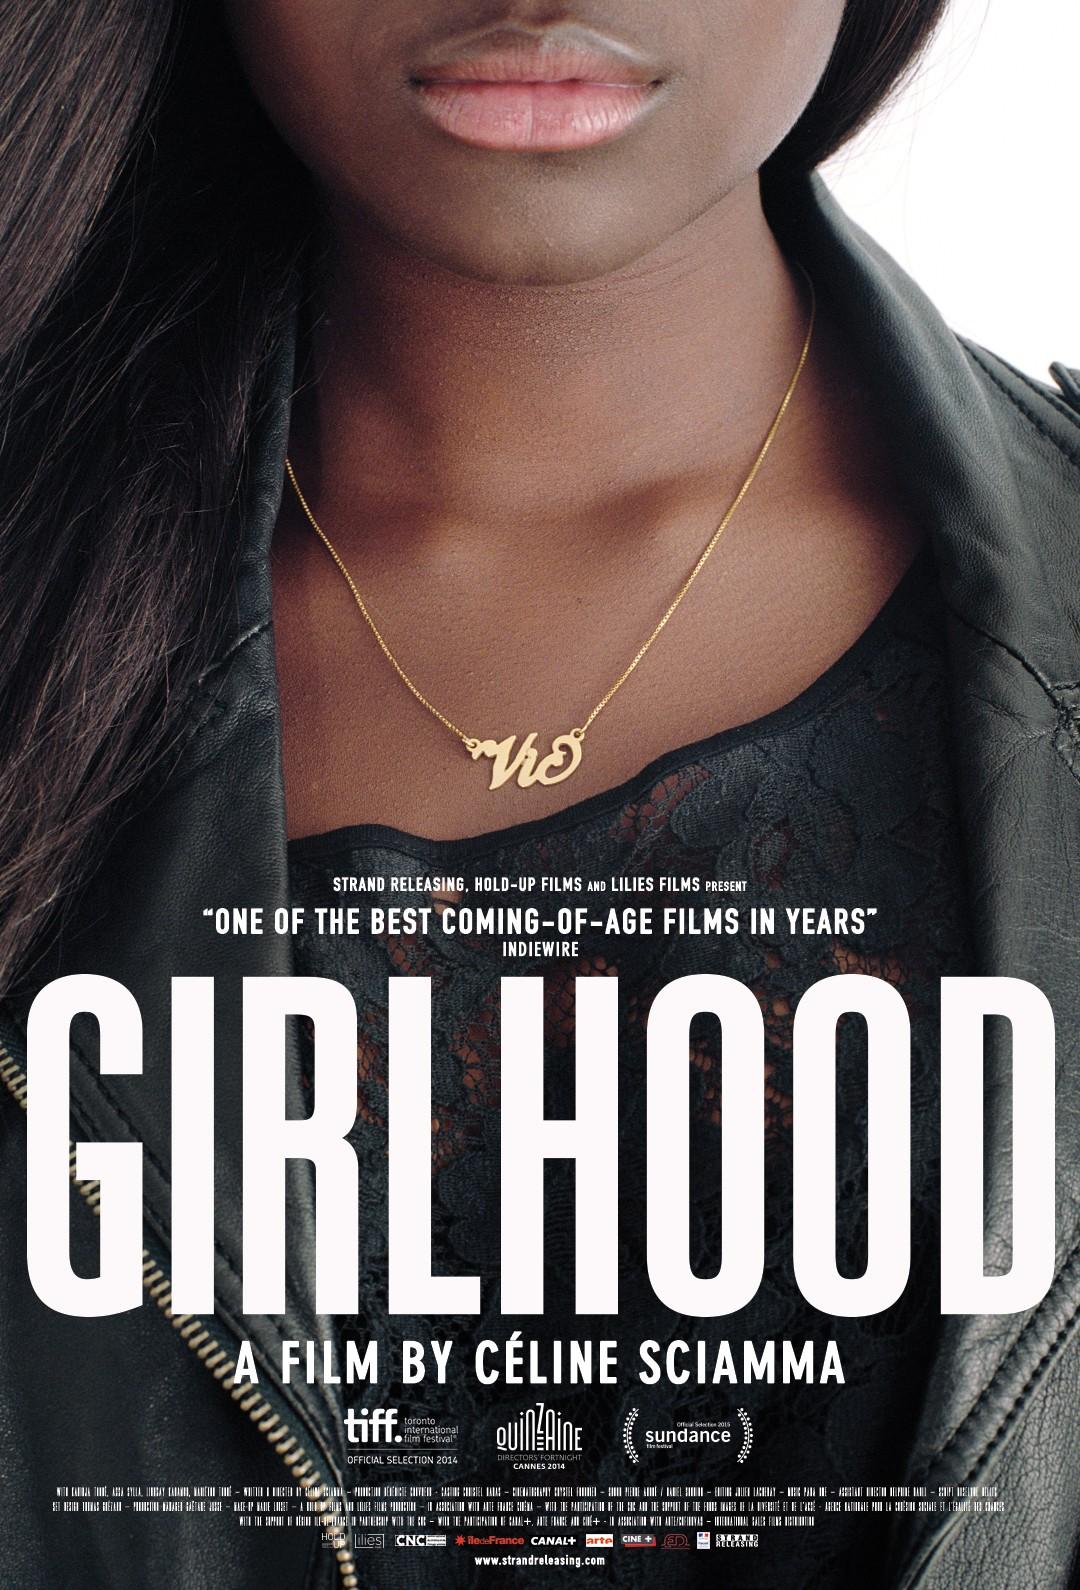 Girlhood (S )(2014) Open House Film Club Presents...